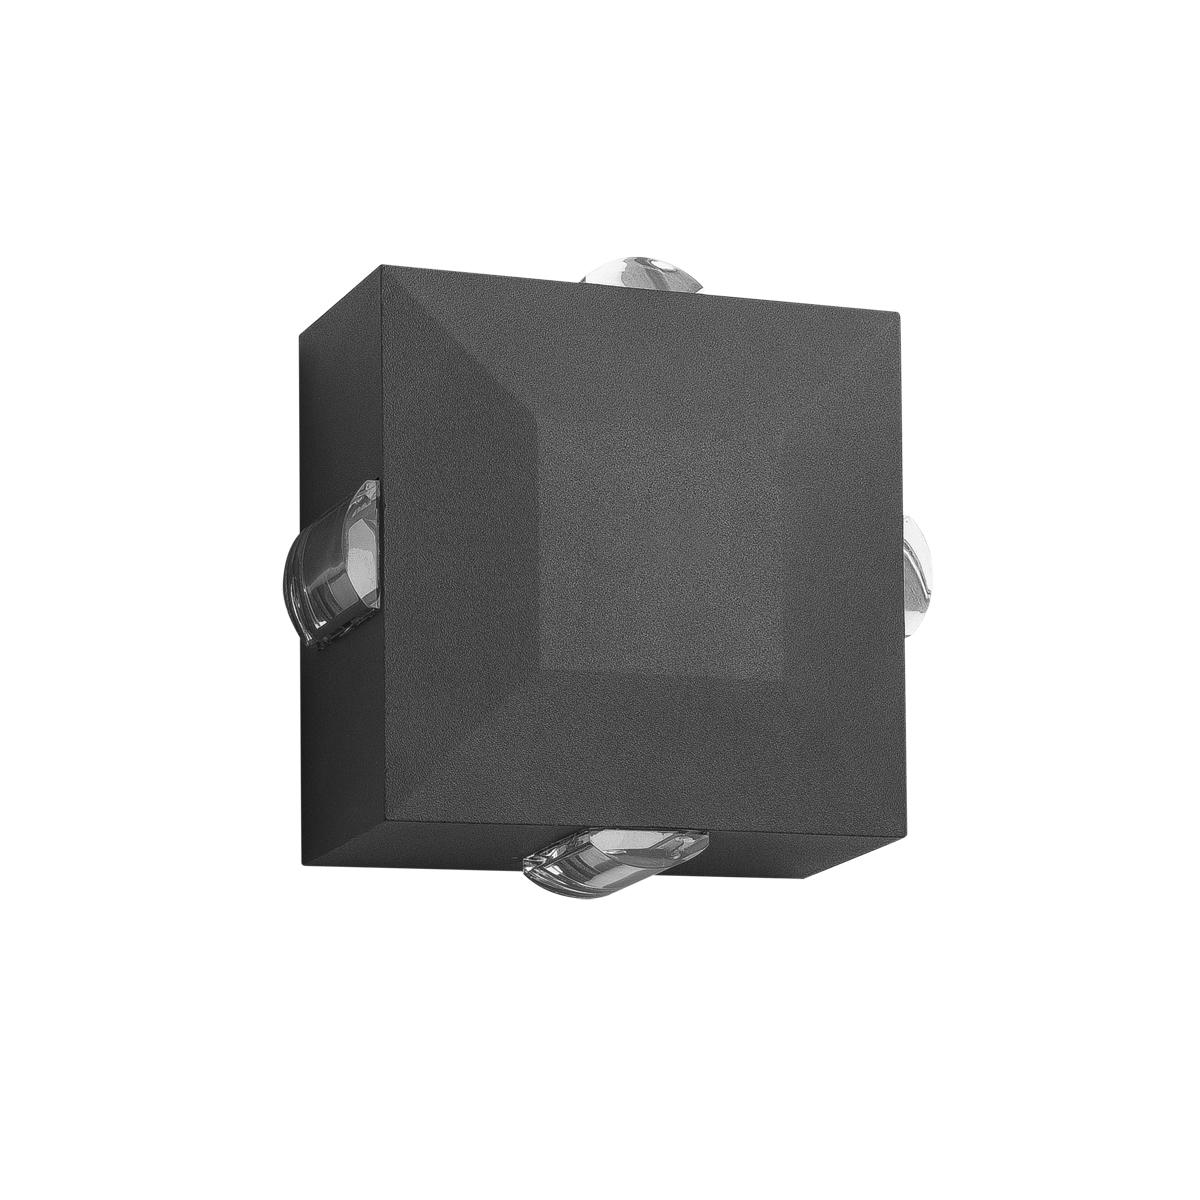 VK LED Φωτιστικό Απλίκα 4W VK02045 IP54